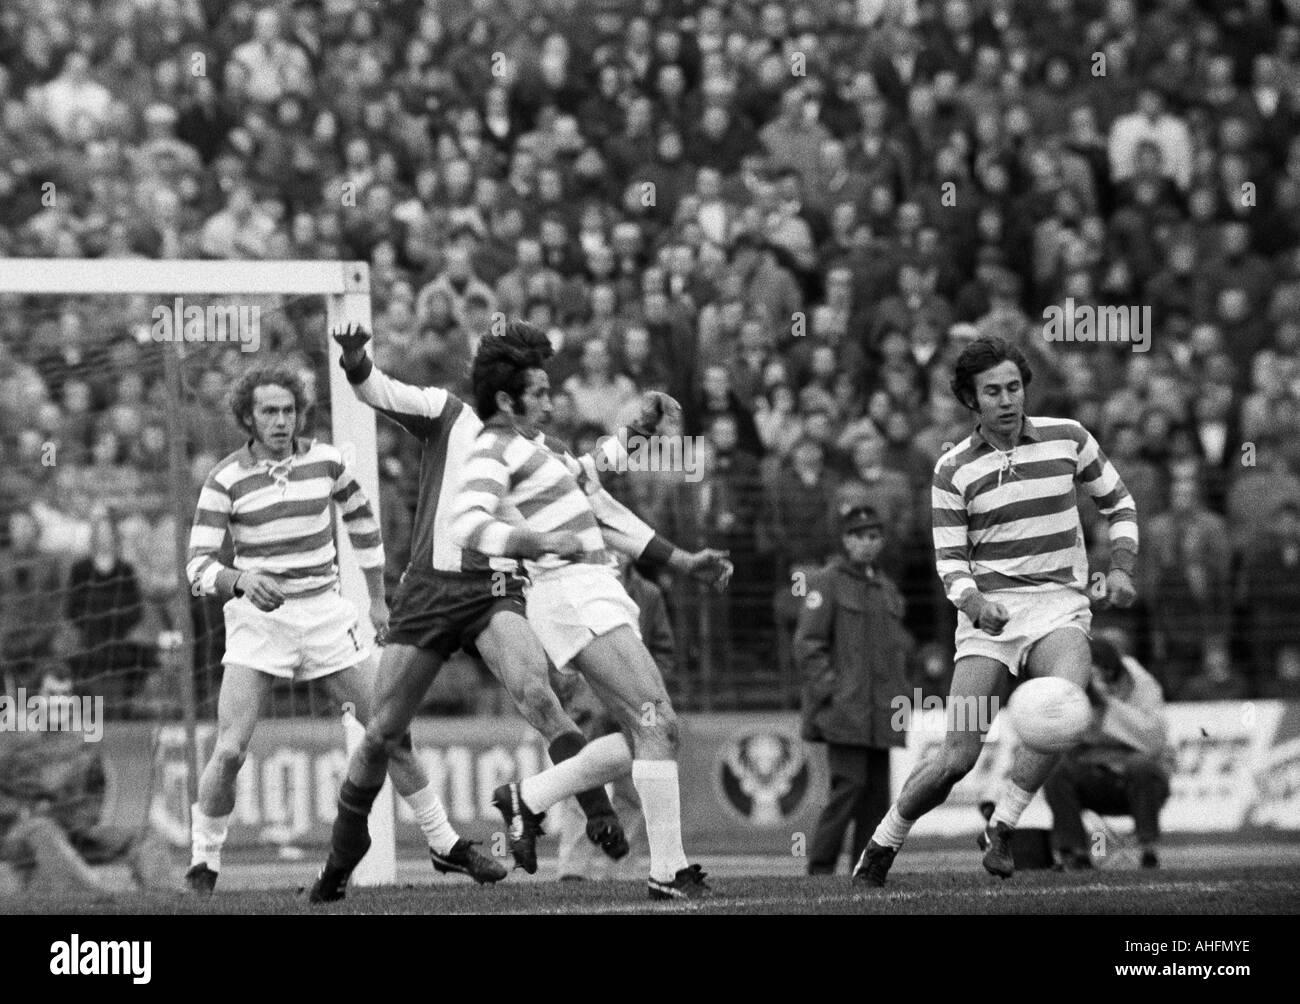 football, Bundesliga, 1971/1972, Wedau Stadium in Duisburg, MSV Duisburg versus FC Bayern Munich 3:0, scene of the match, f.l.t.r. Heinz Peter Buchberger (MSV), Djordje Pavlic (MSV), Detlef Pirsig (MSV) - Stock Image